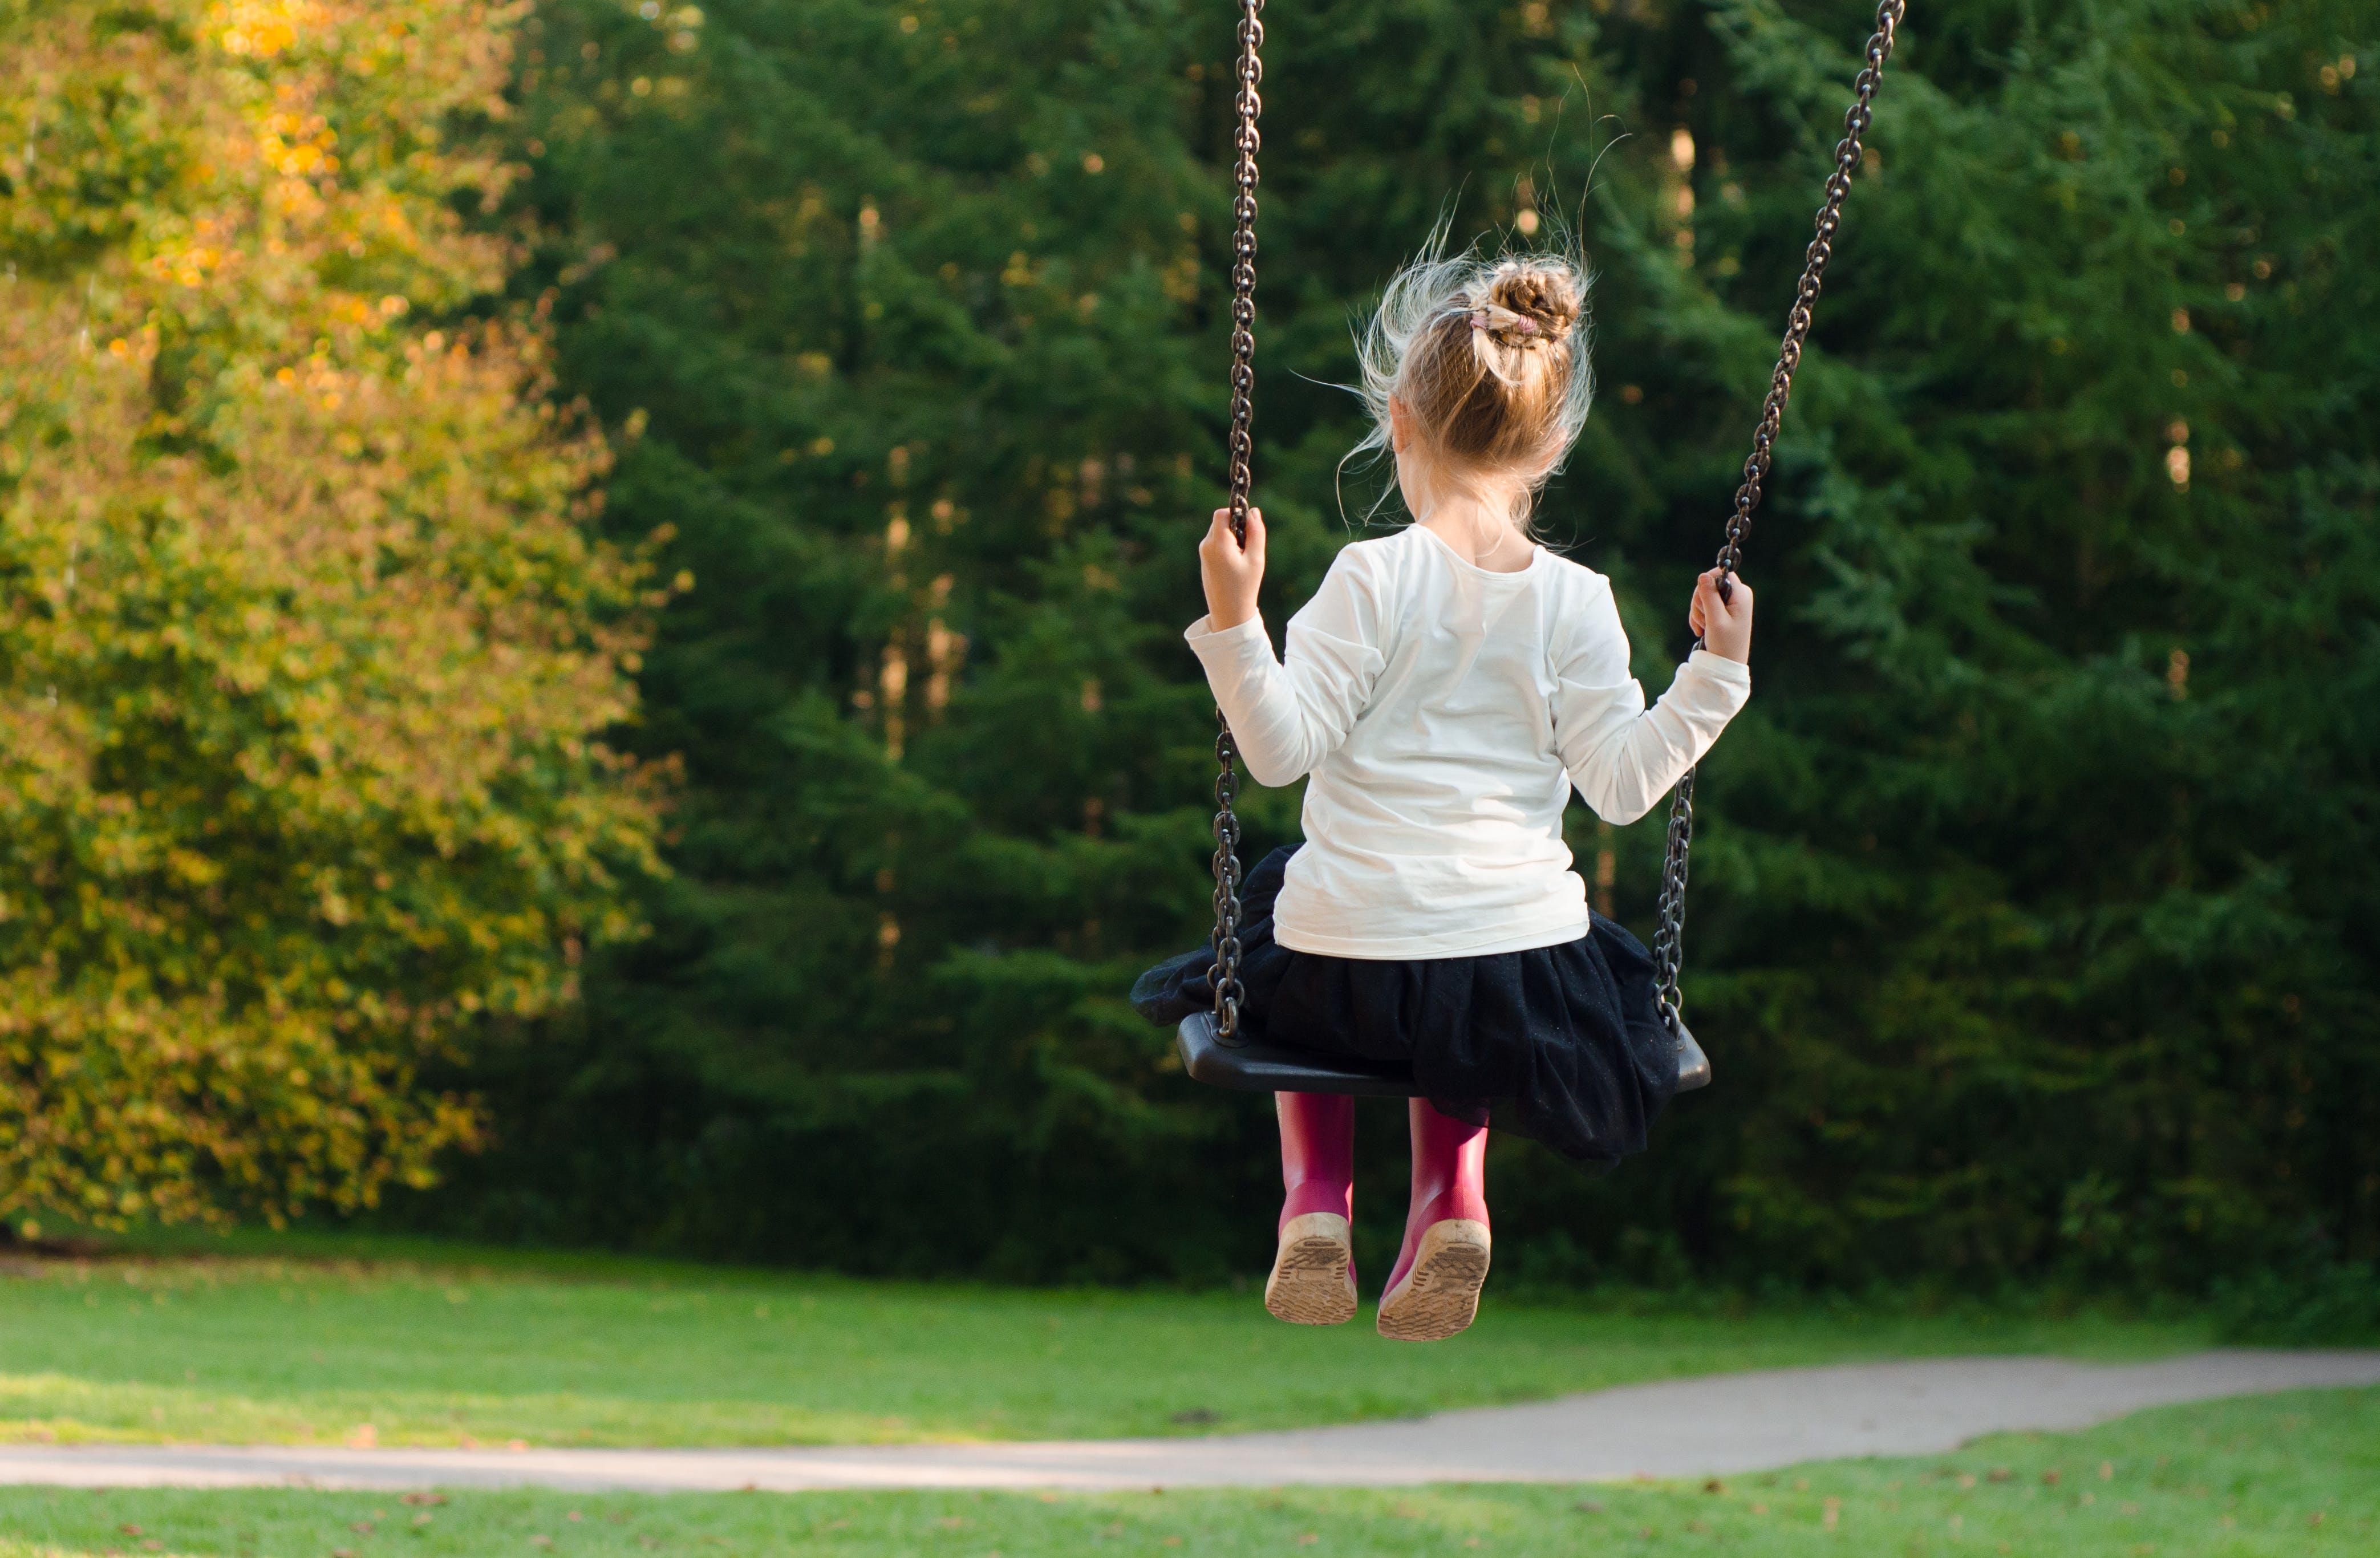 Fotos de stock gratuitas de arboles, balancearse, joven, niña